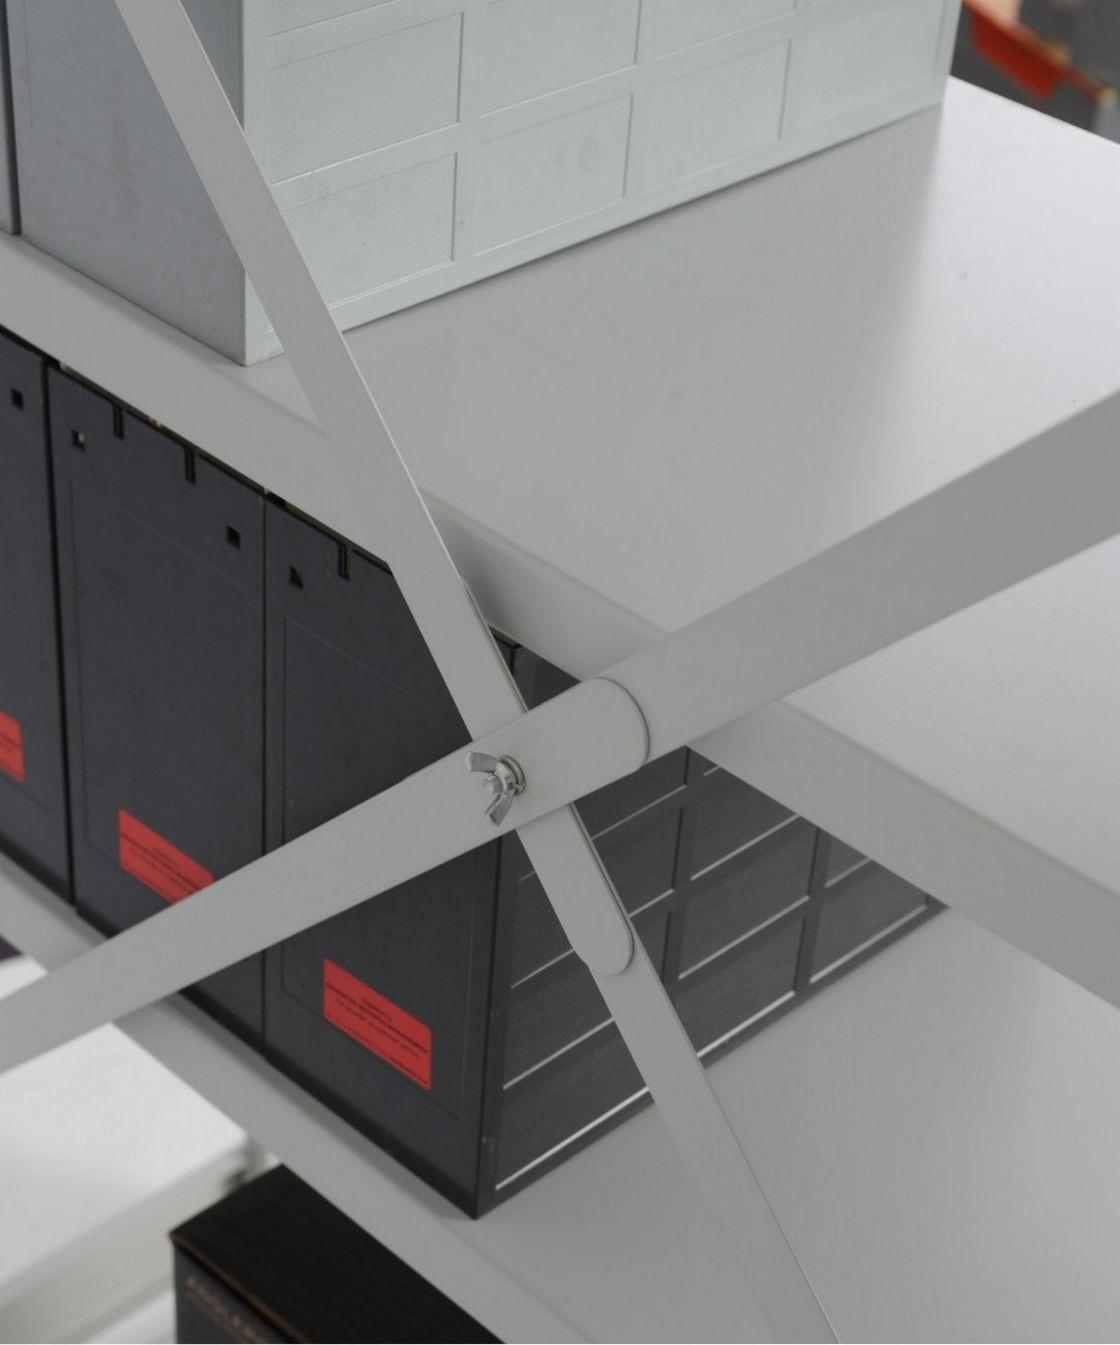 Stahlregal mit Kreuzdiagonale